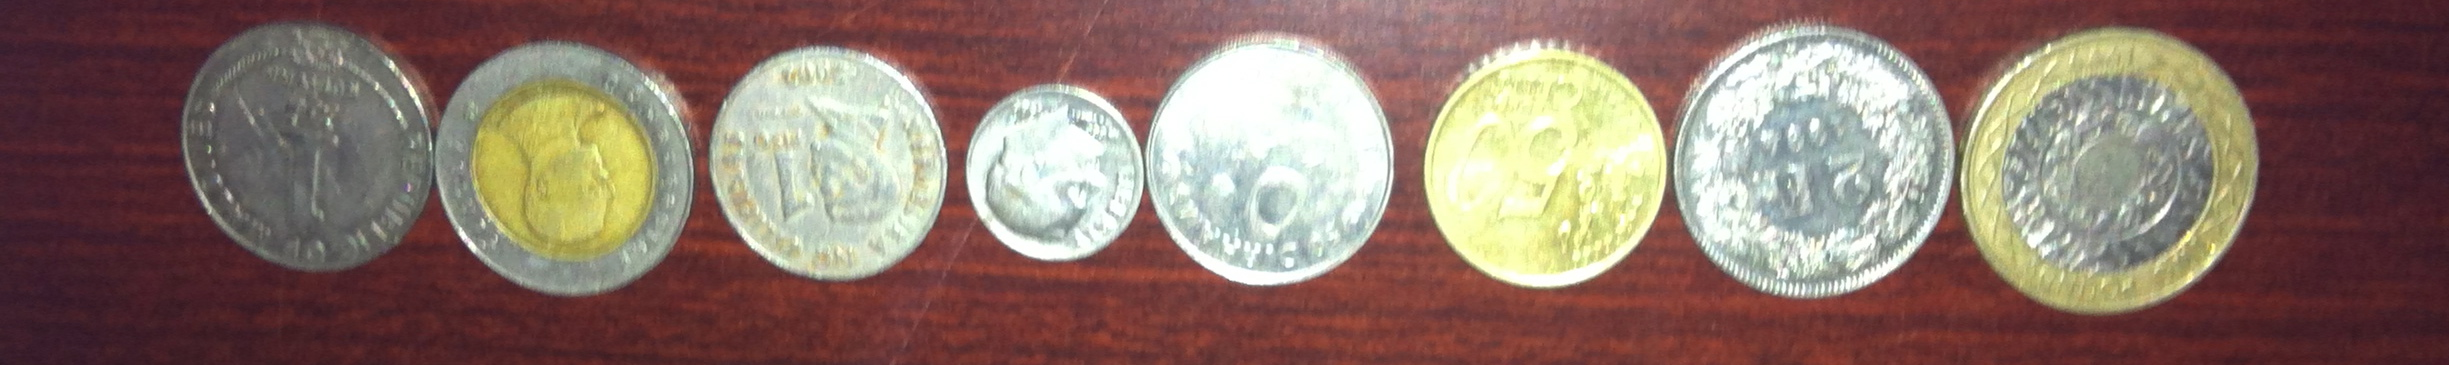 Just an example of Kiddo's piggy bank stash:    1 Rufiyaa Maldives, 10 Thai Baht, 1 Philippines Peso, 1 American dime, 50 Dirhams (Qatari), 50 Cent Euro, 2 Swiss Francs, 2 British pounds